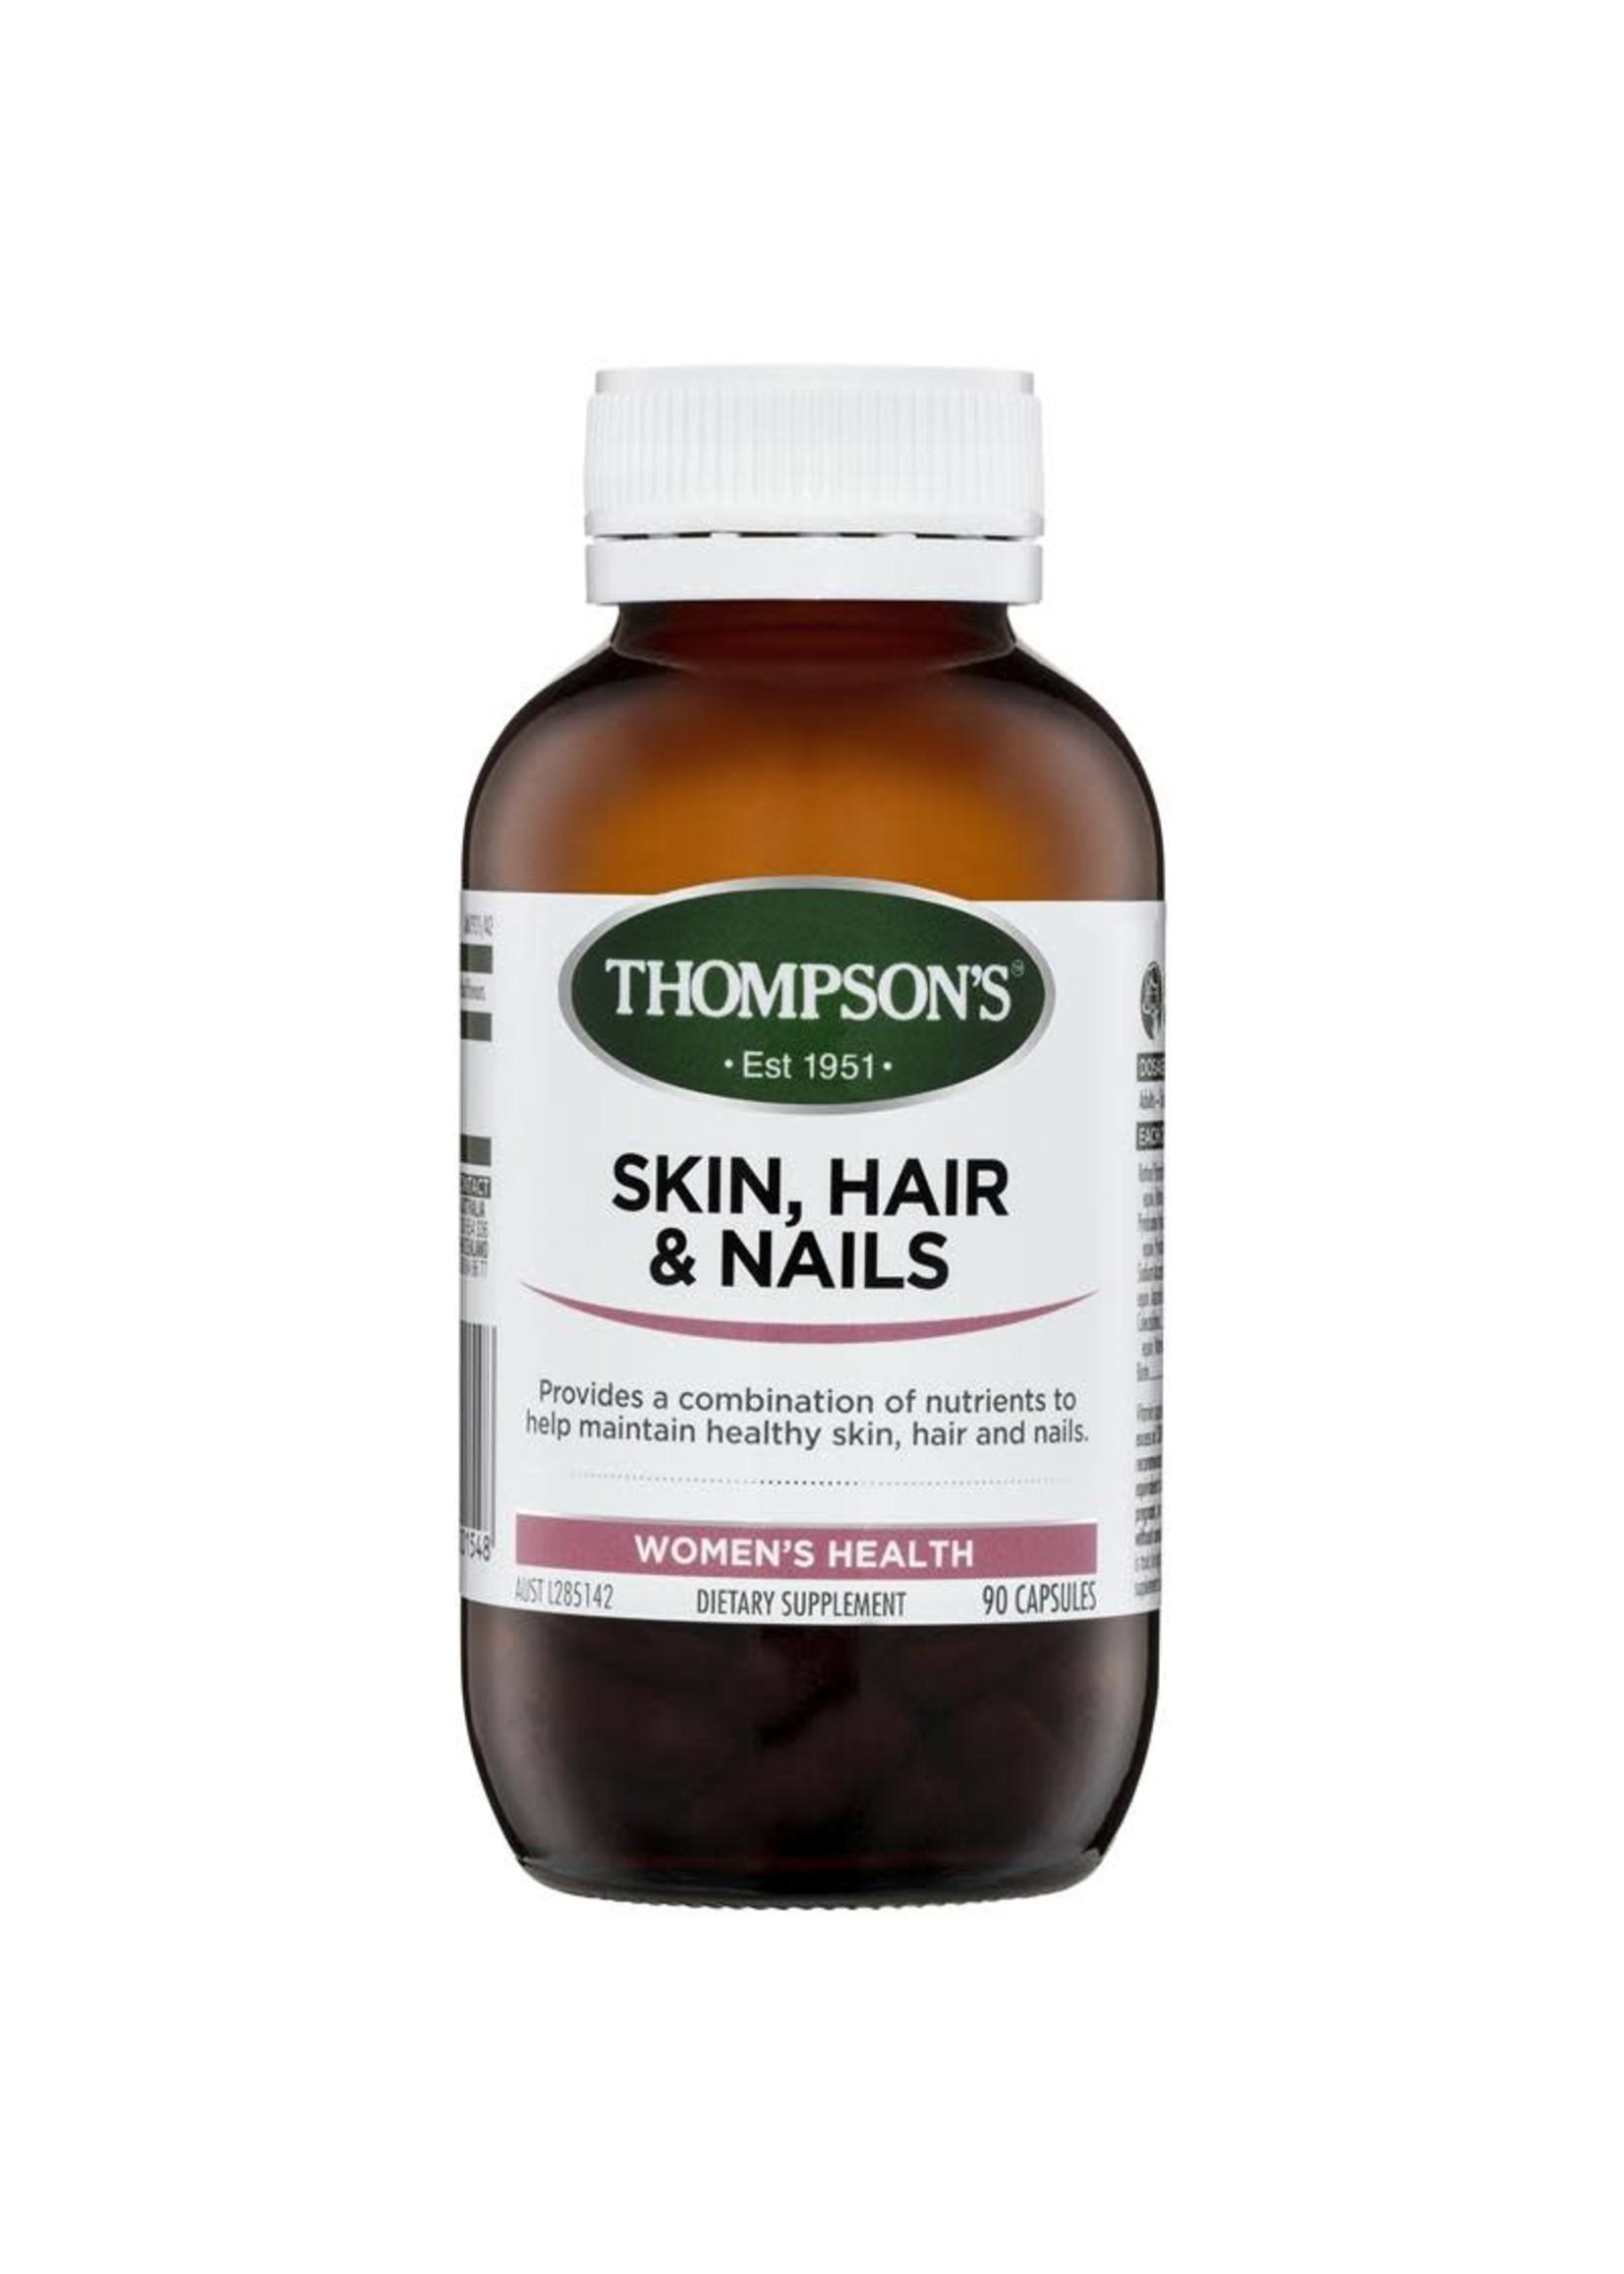 Thompson's Thompsons Skin, Hair & Nails 90 caps